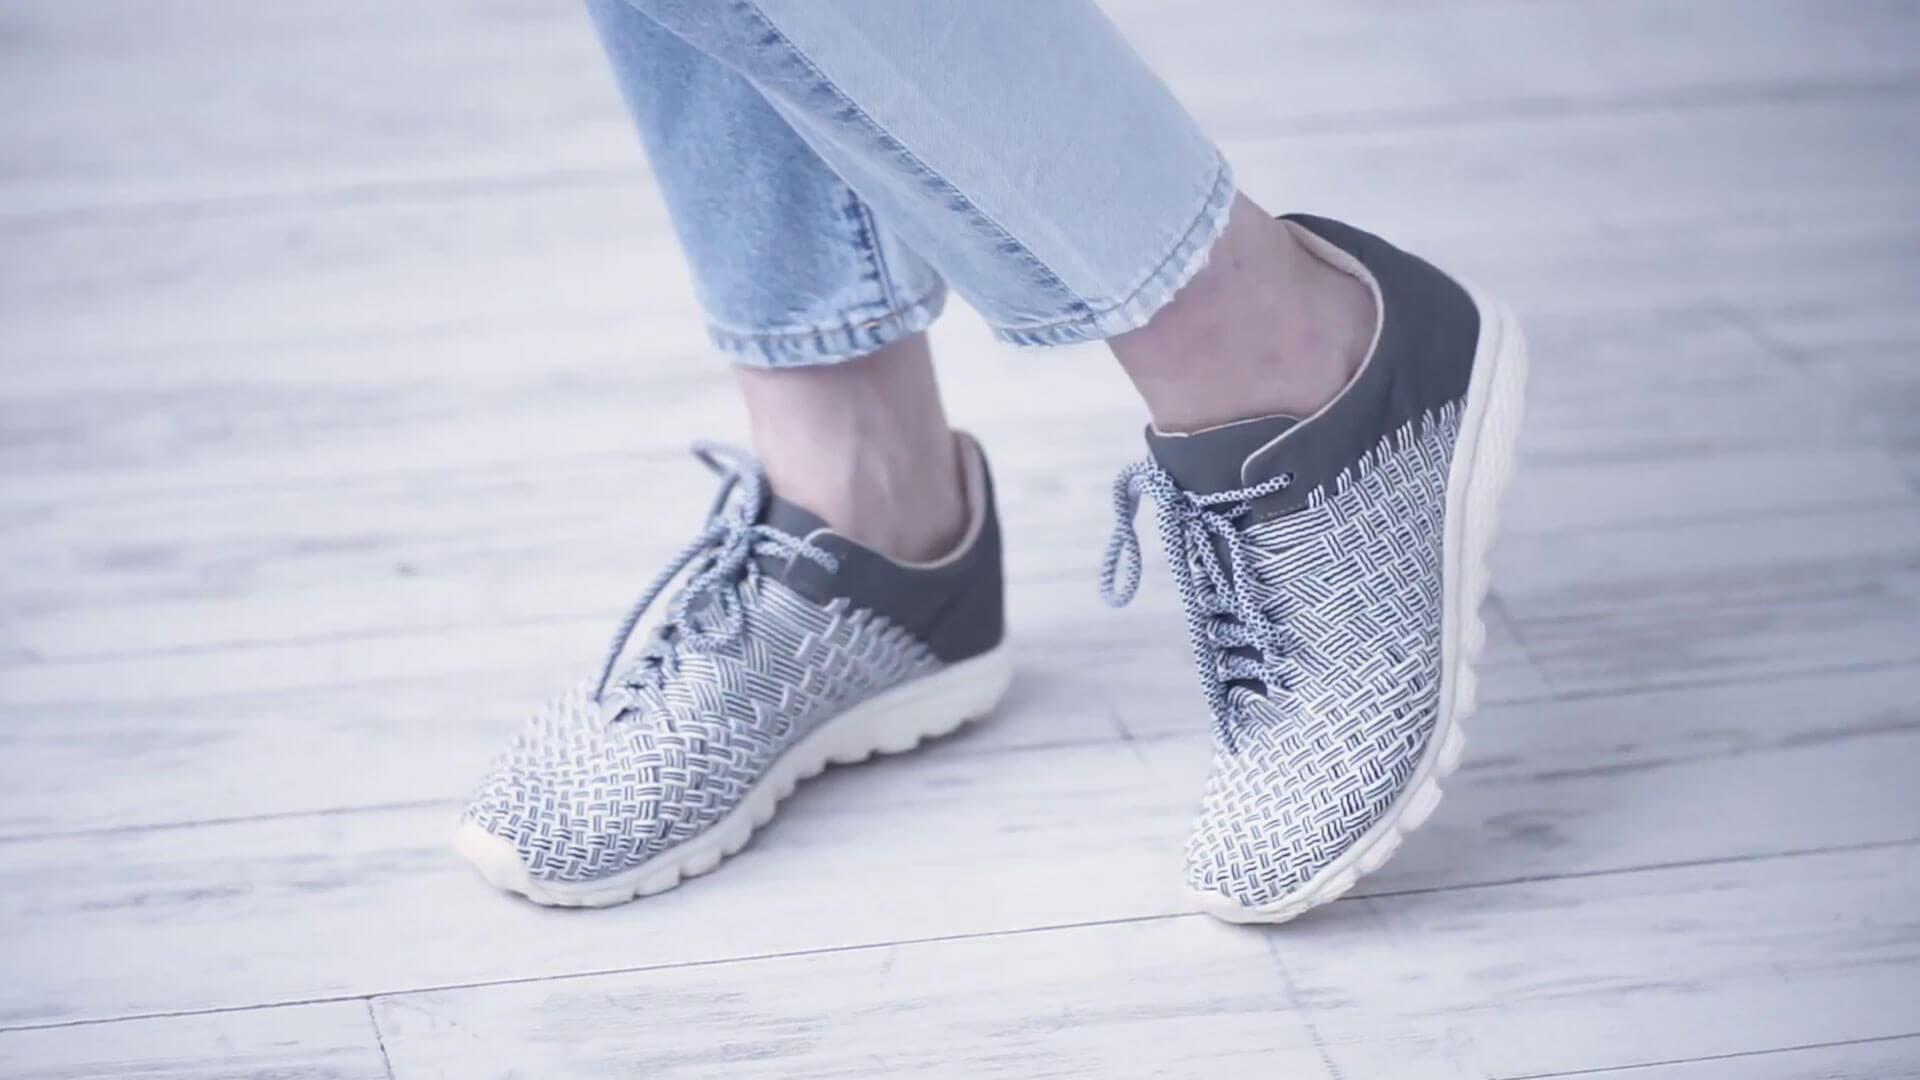 fb39c72f8fb Gumičková obuv